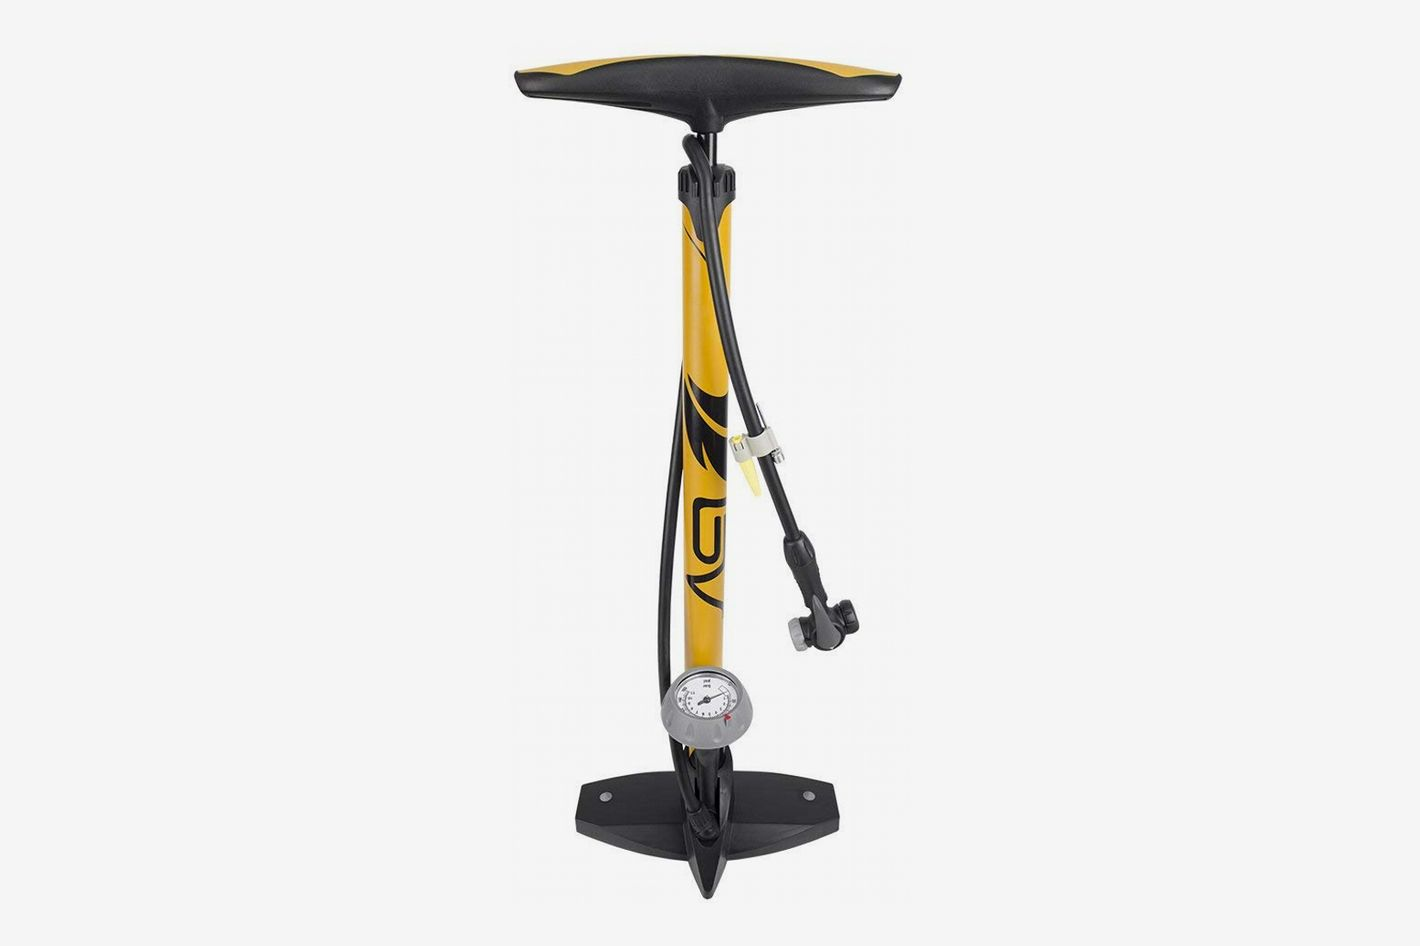 BV Bicycle Ergonomic Bike Floor Pump with Gauge & Smart Valve Head